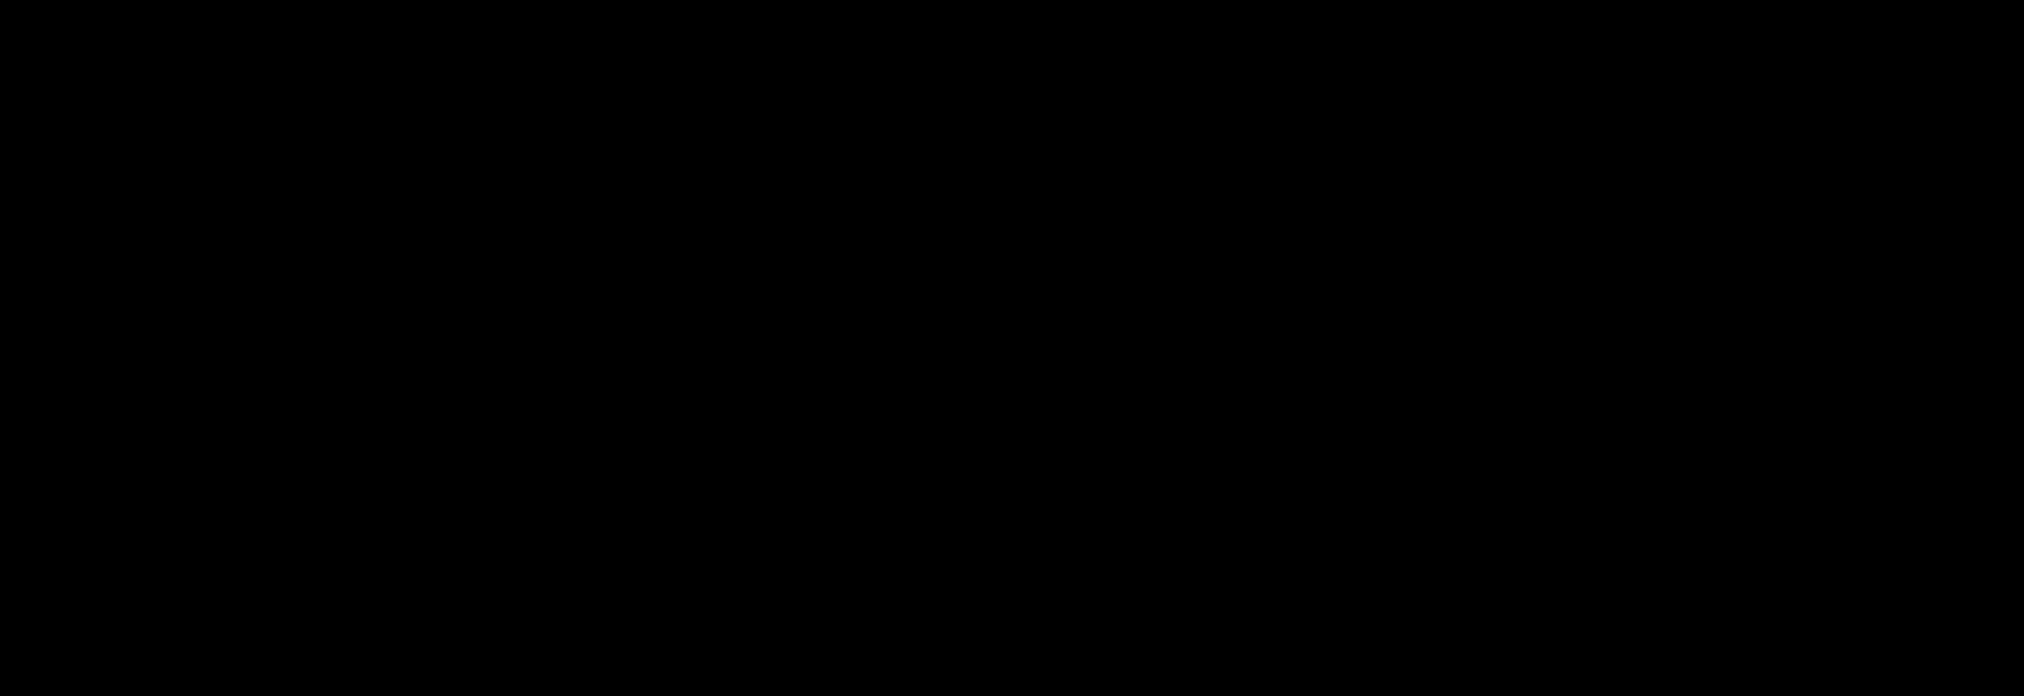 Curcumin-d<sub>6</sub>